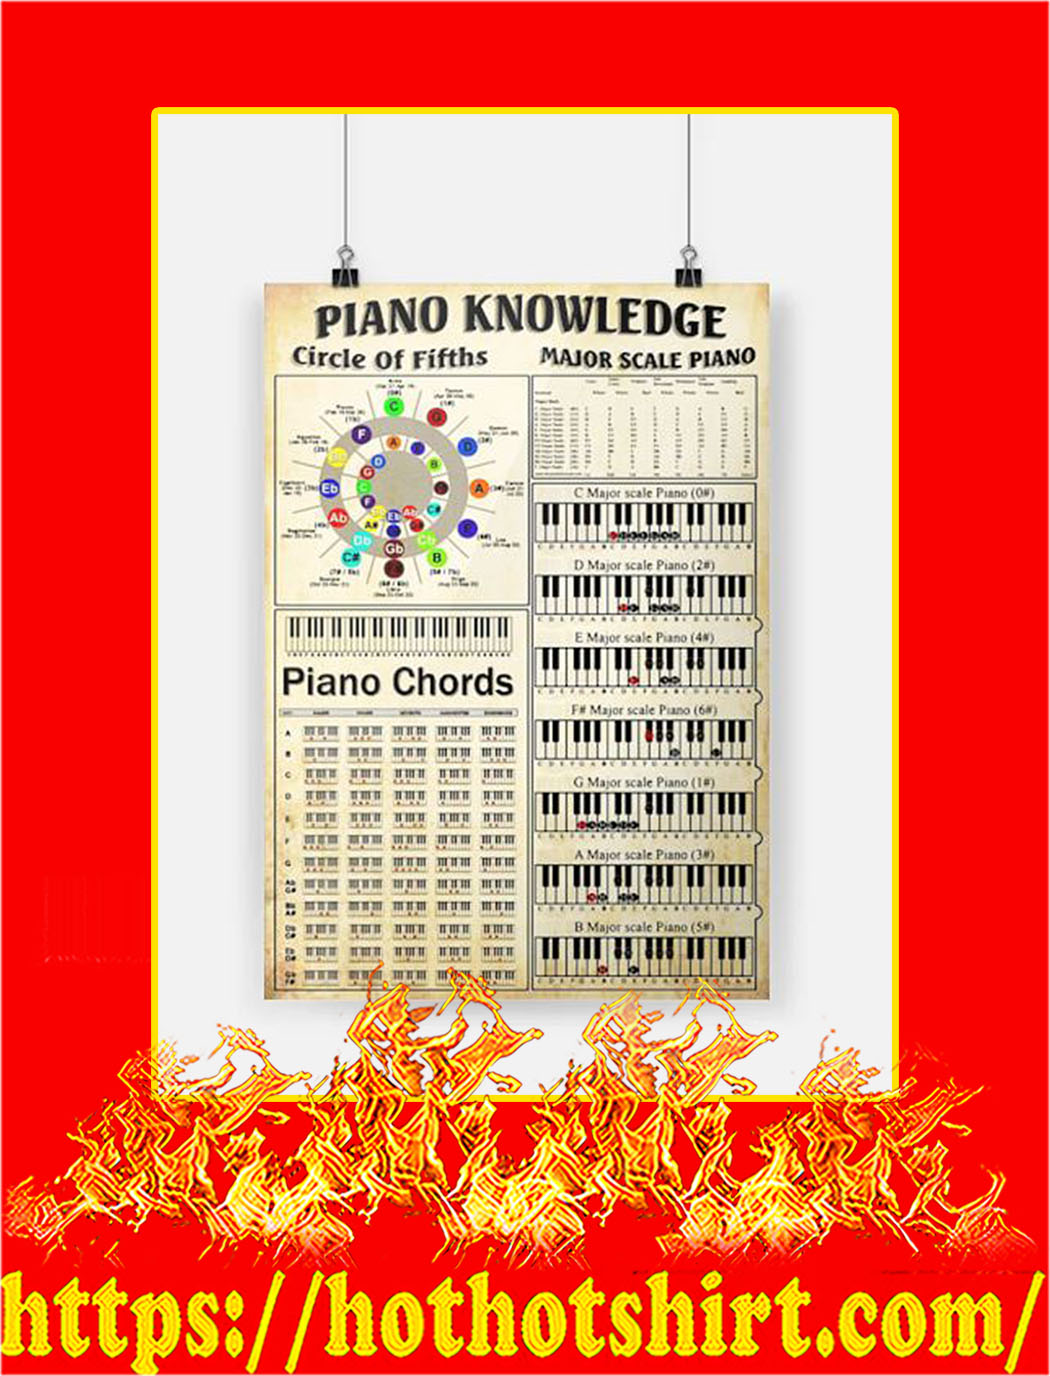 Pinano Knowledge Poster - A3